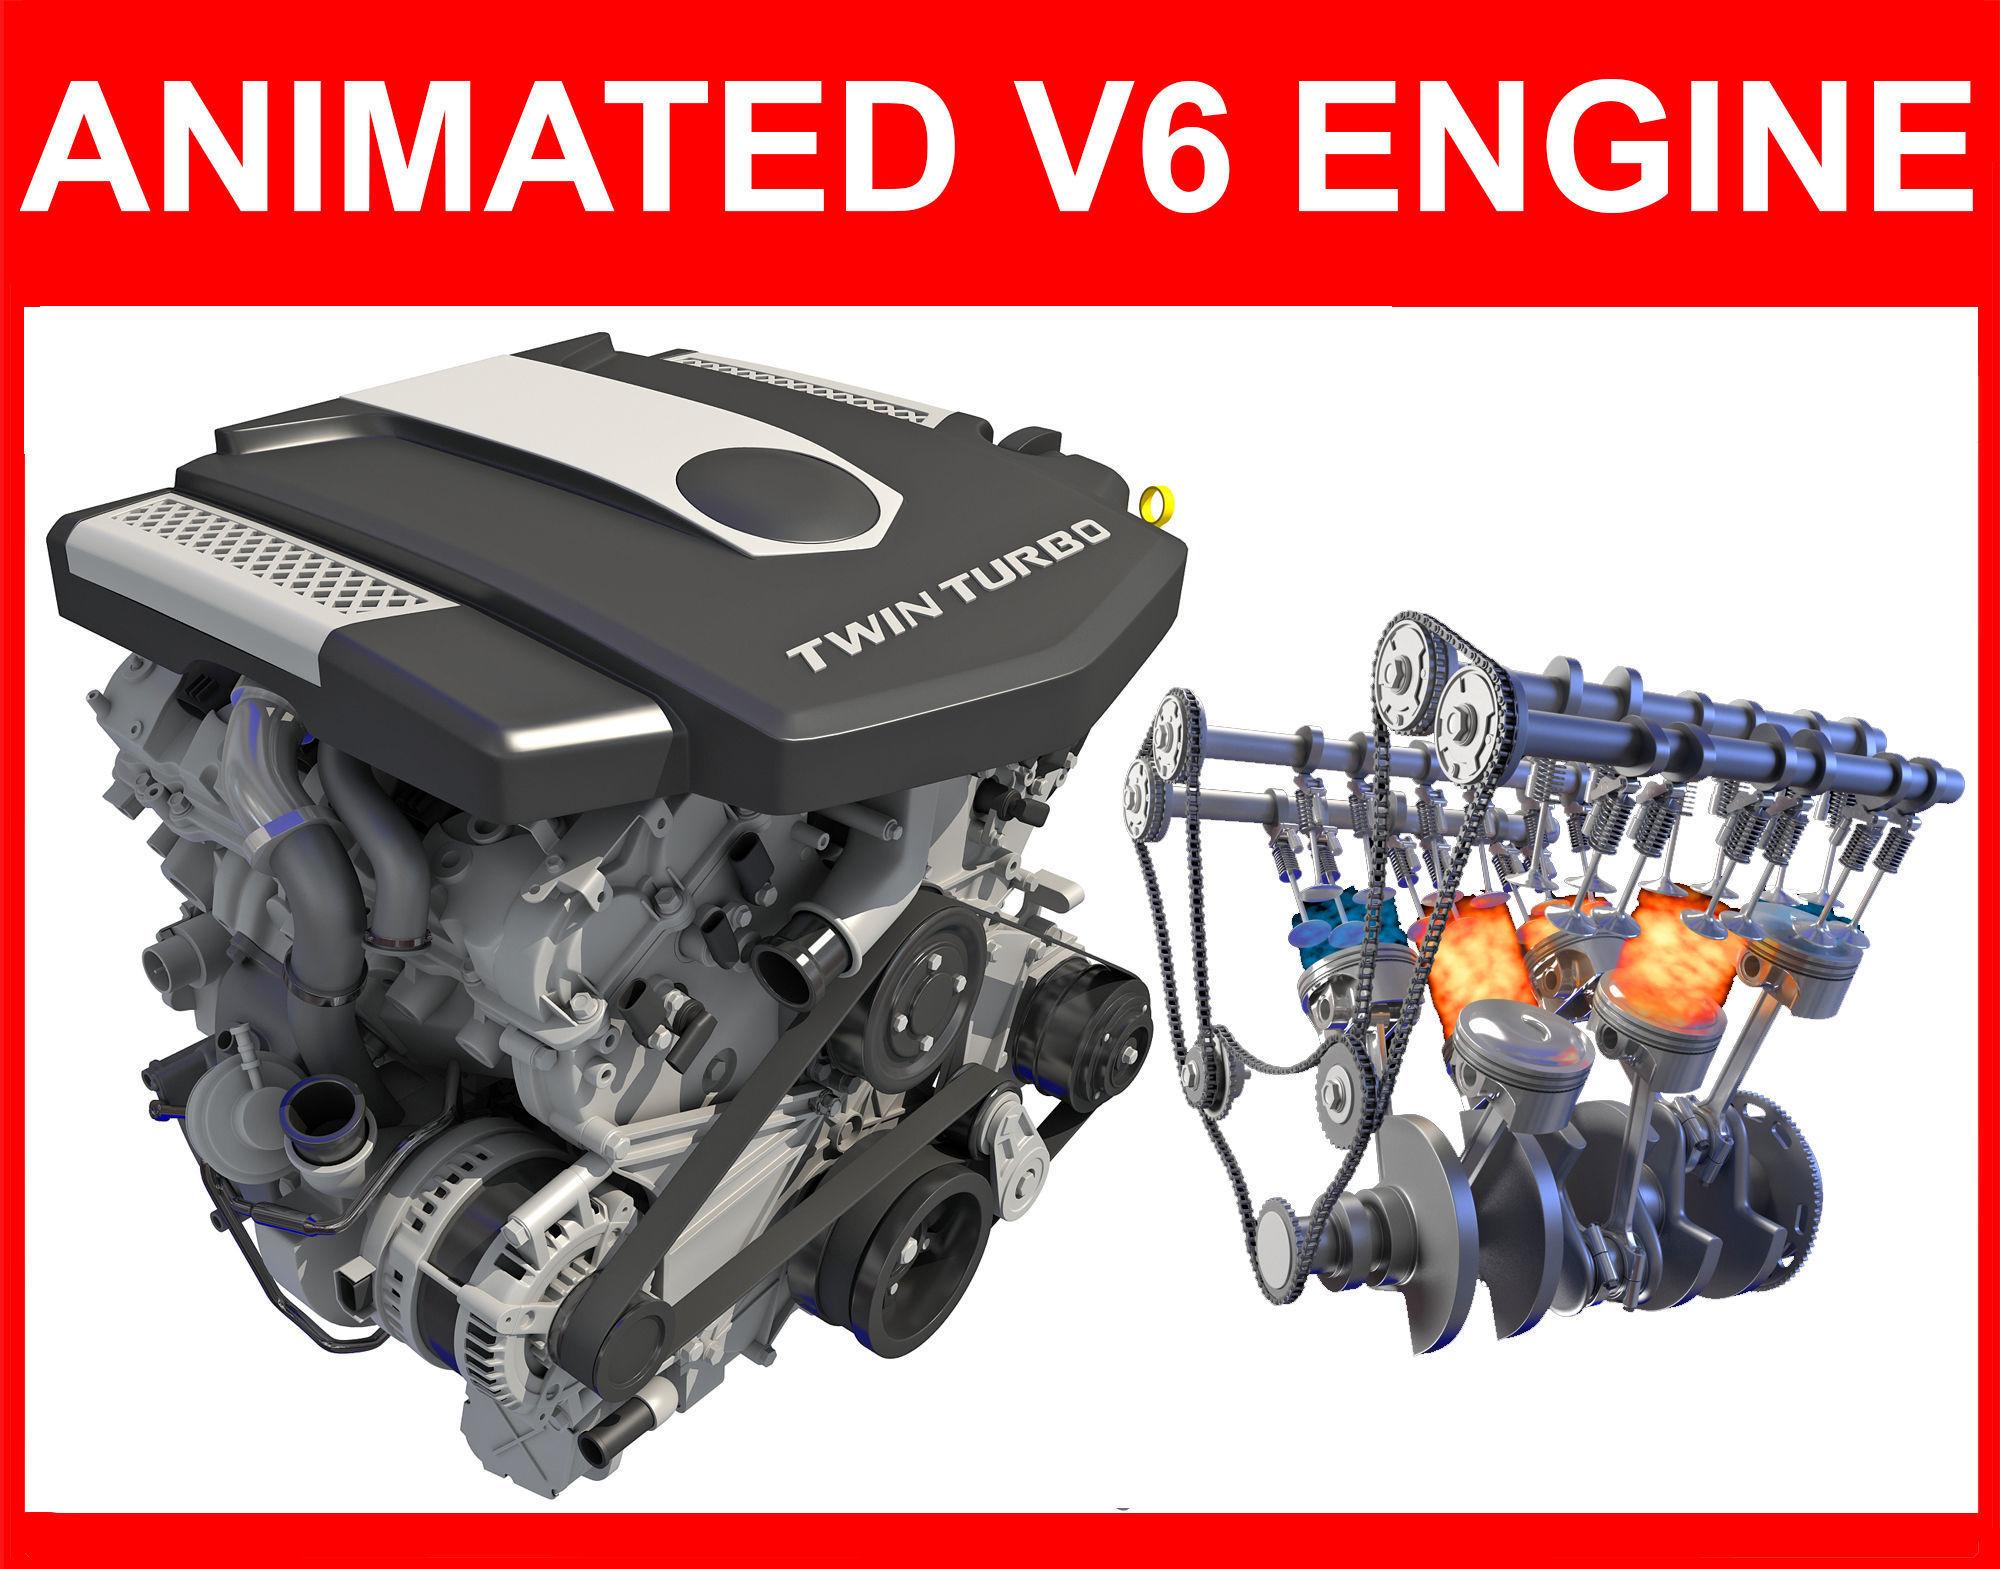 V6 Engine with Gasoline Ignition Animation